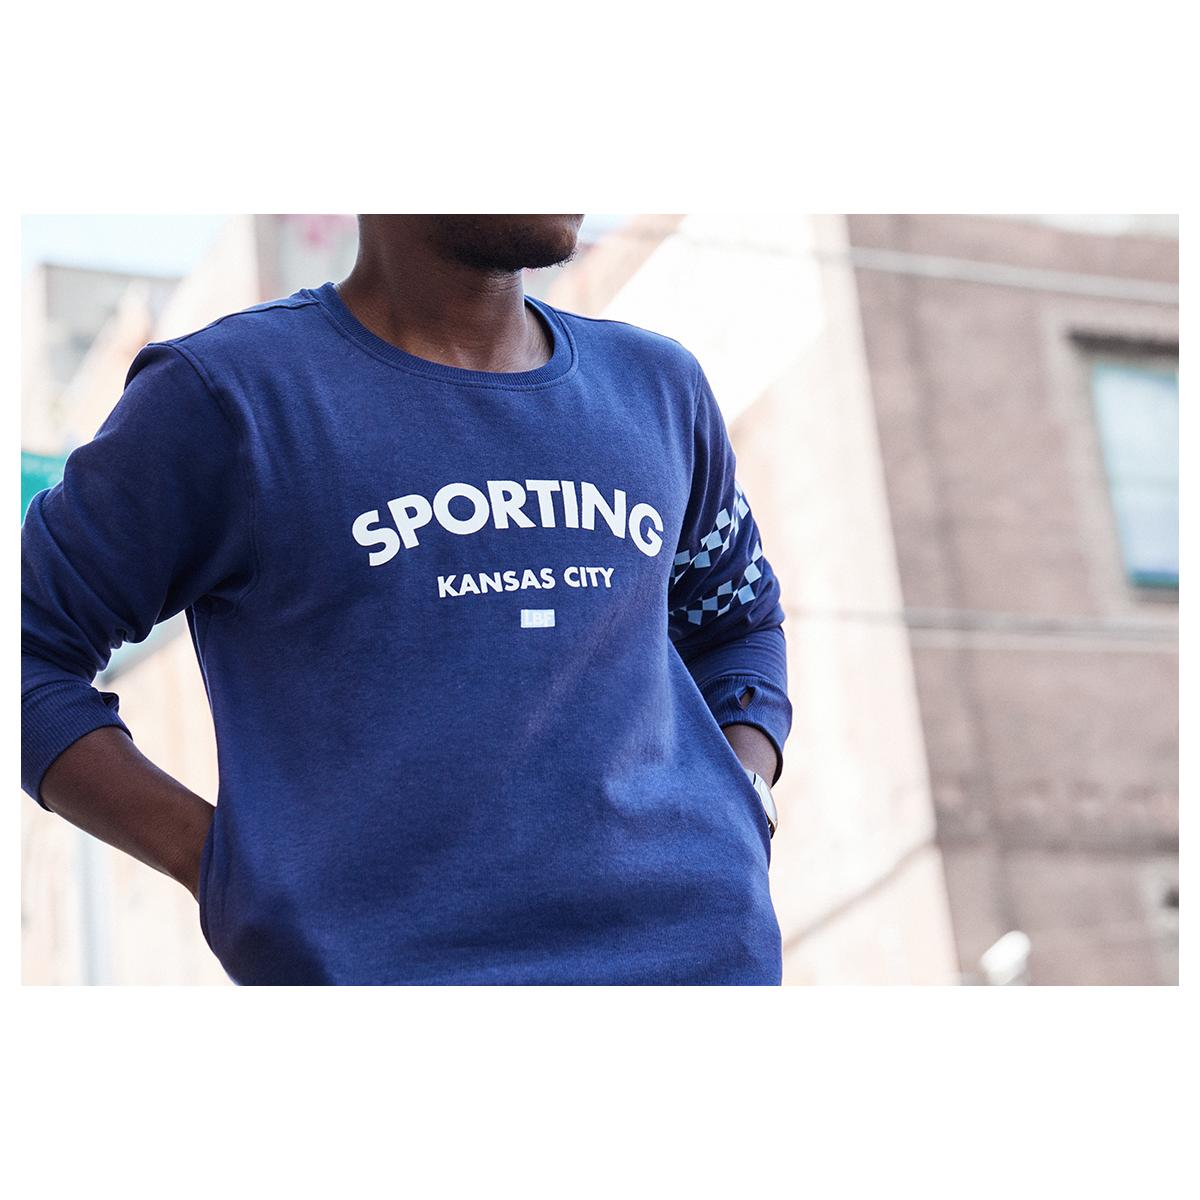 Classic typeface on the navy sweatshirt for SKCxLBF